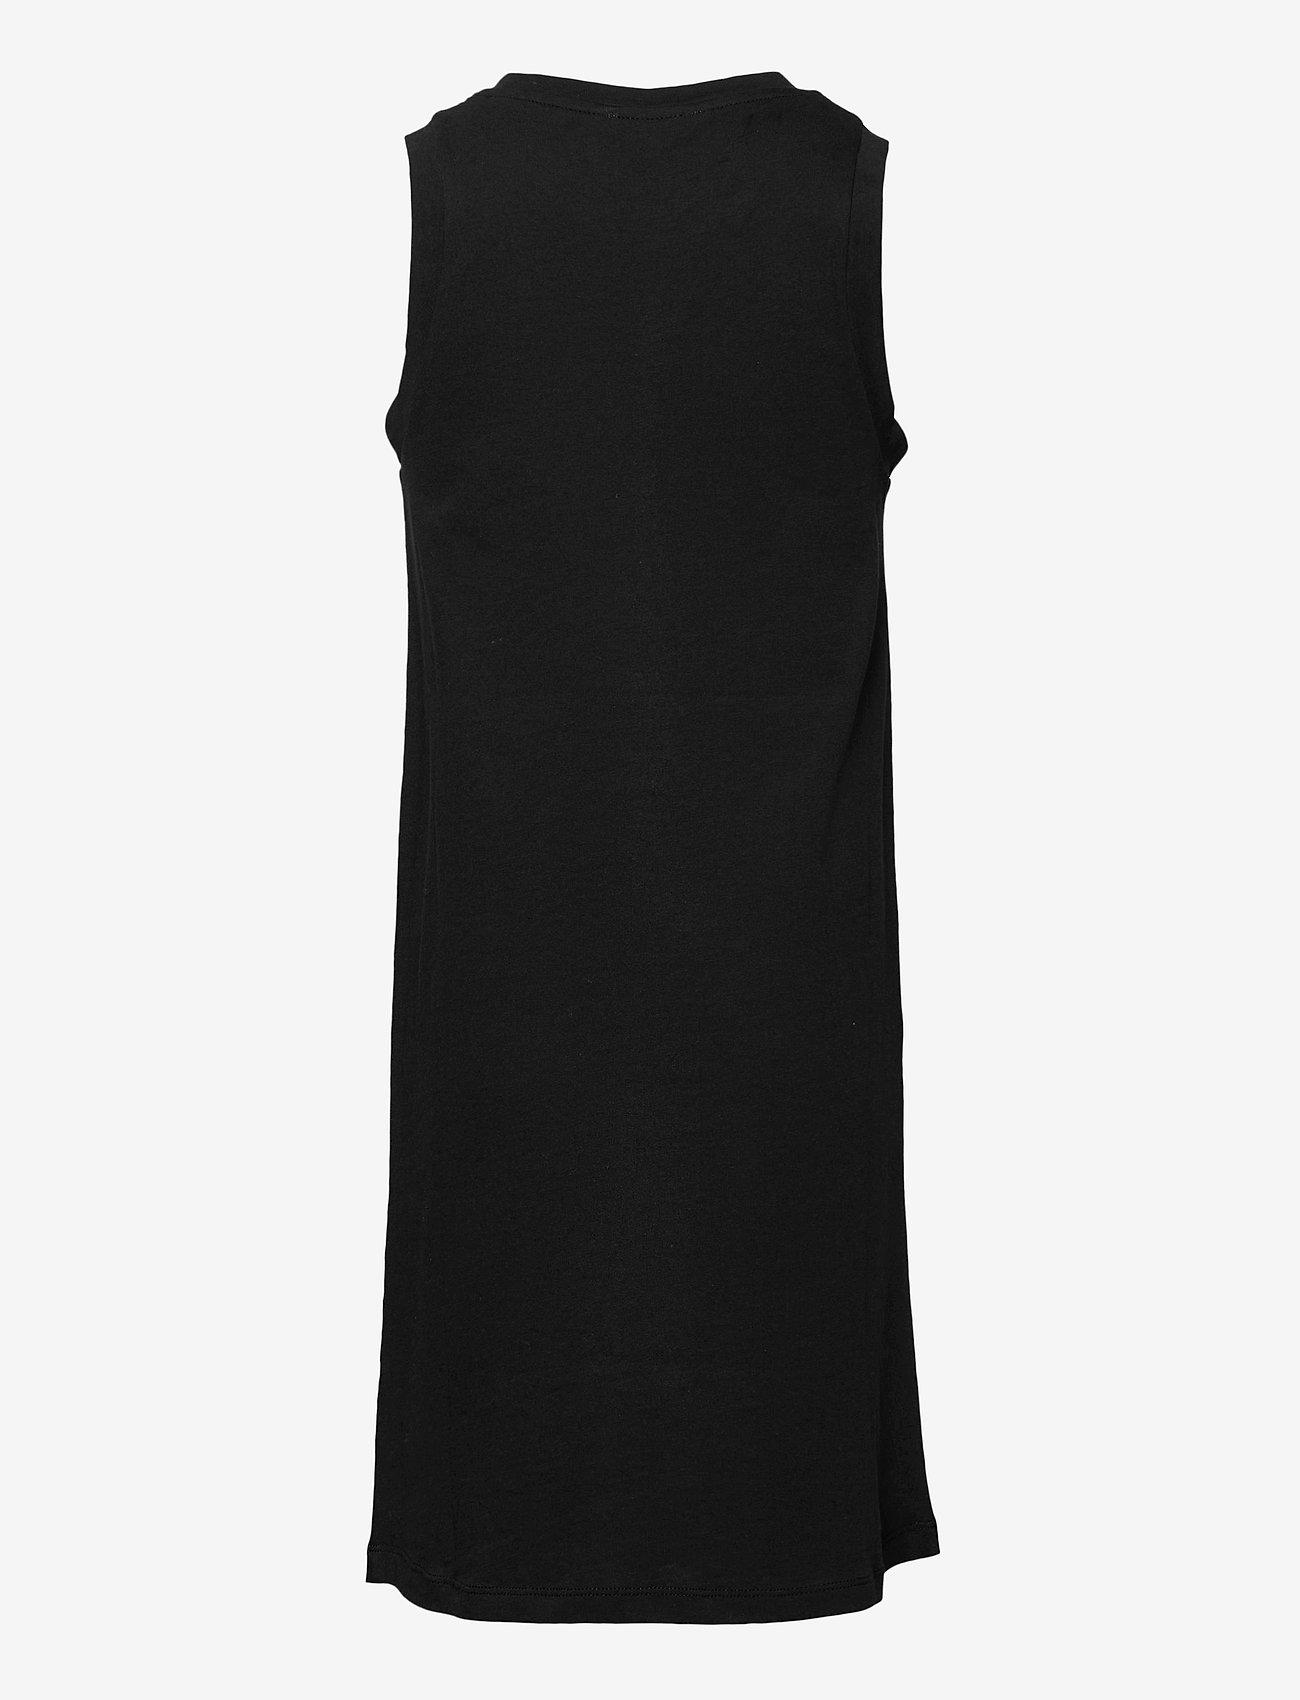 Calvin Klein - TANK DRESS - Ärmellose - pvh black - 1